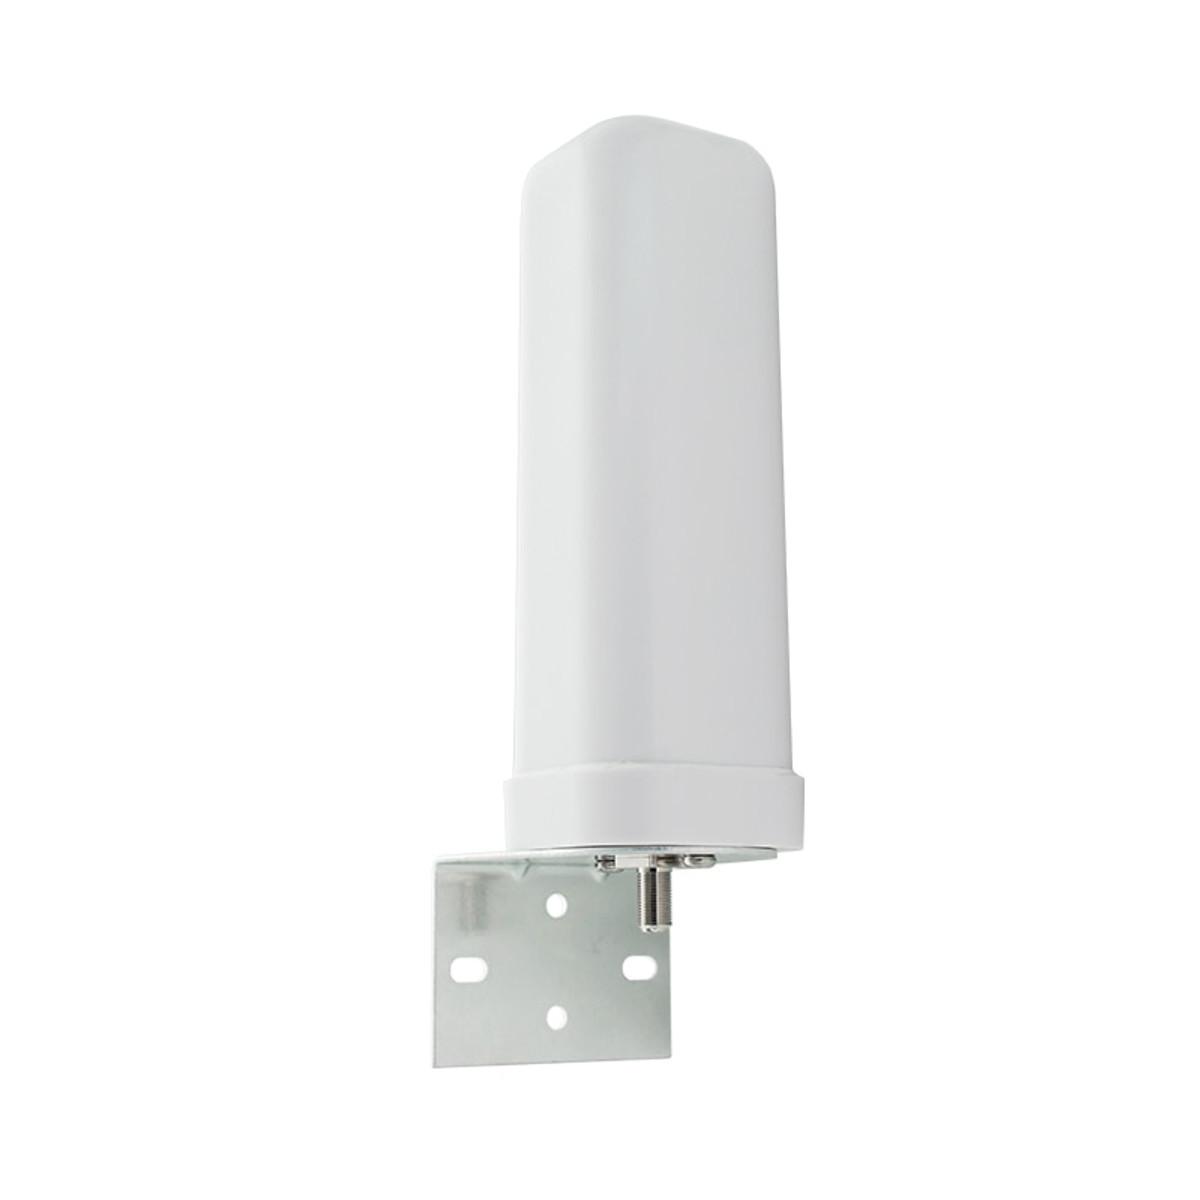 Wilson Electronics 4G Omni Residential Antenna, 75 Ohm - 304421